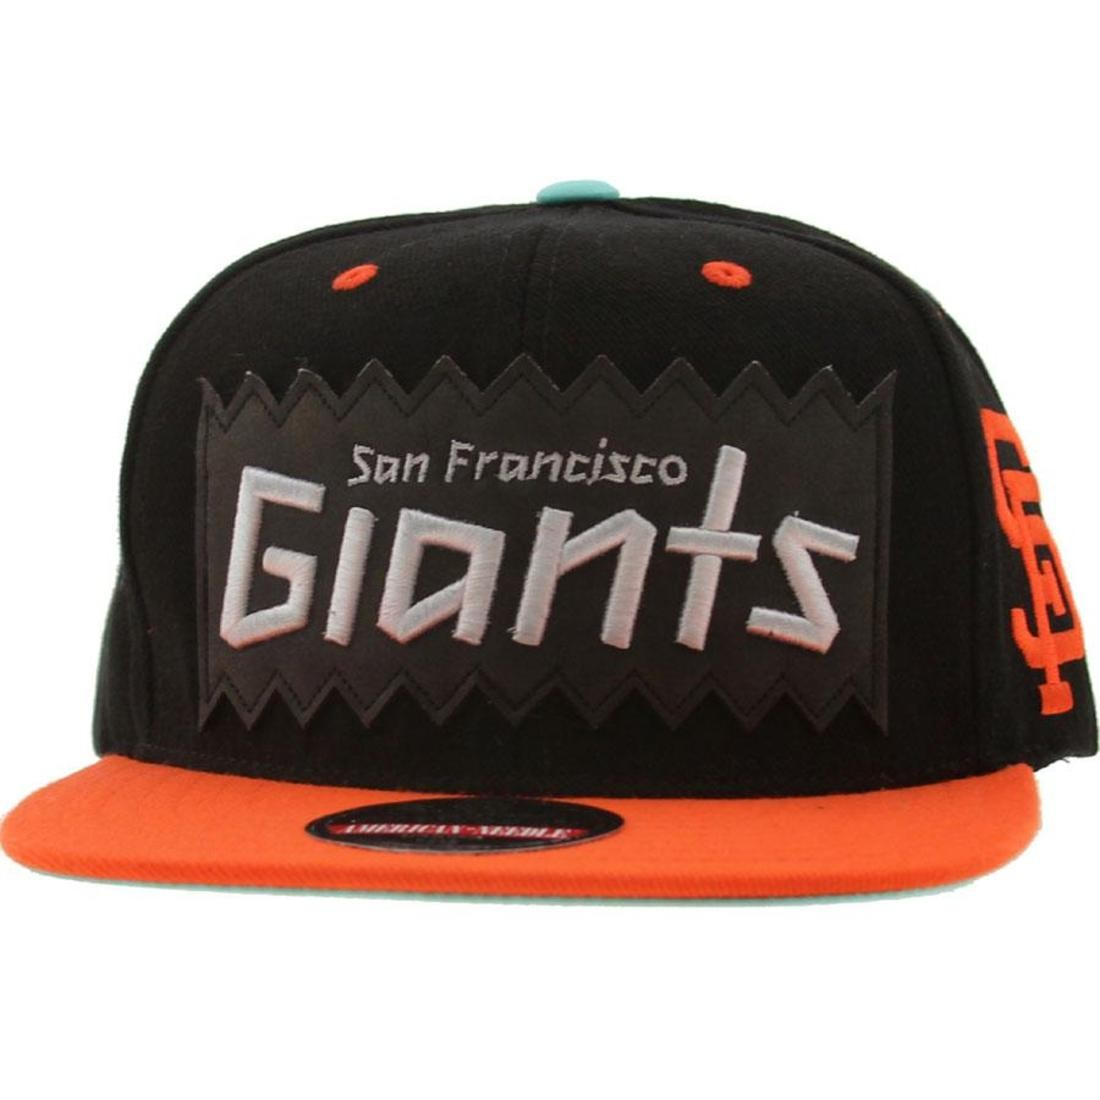 c1e0bad1ec4 BAIT x MLB x American Needle San Francisco Giants Retro Snapback ...